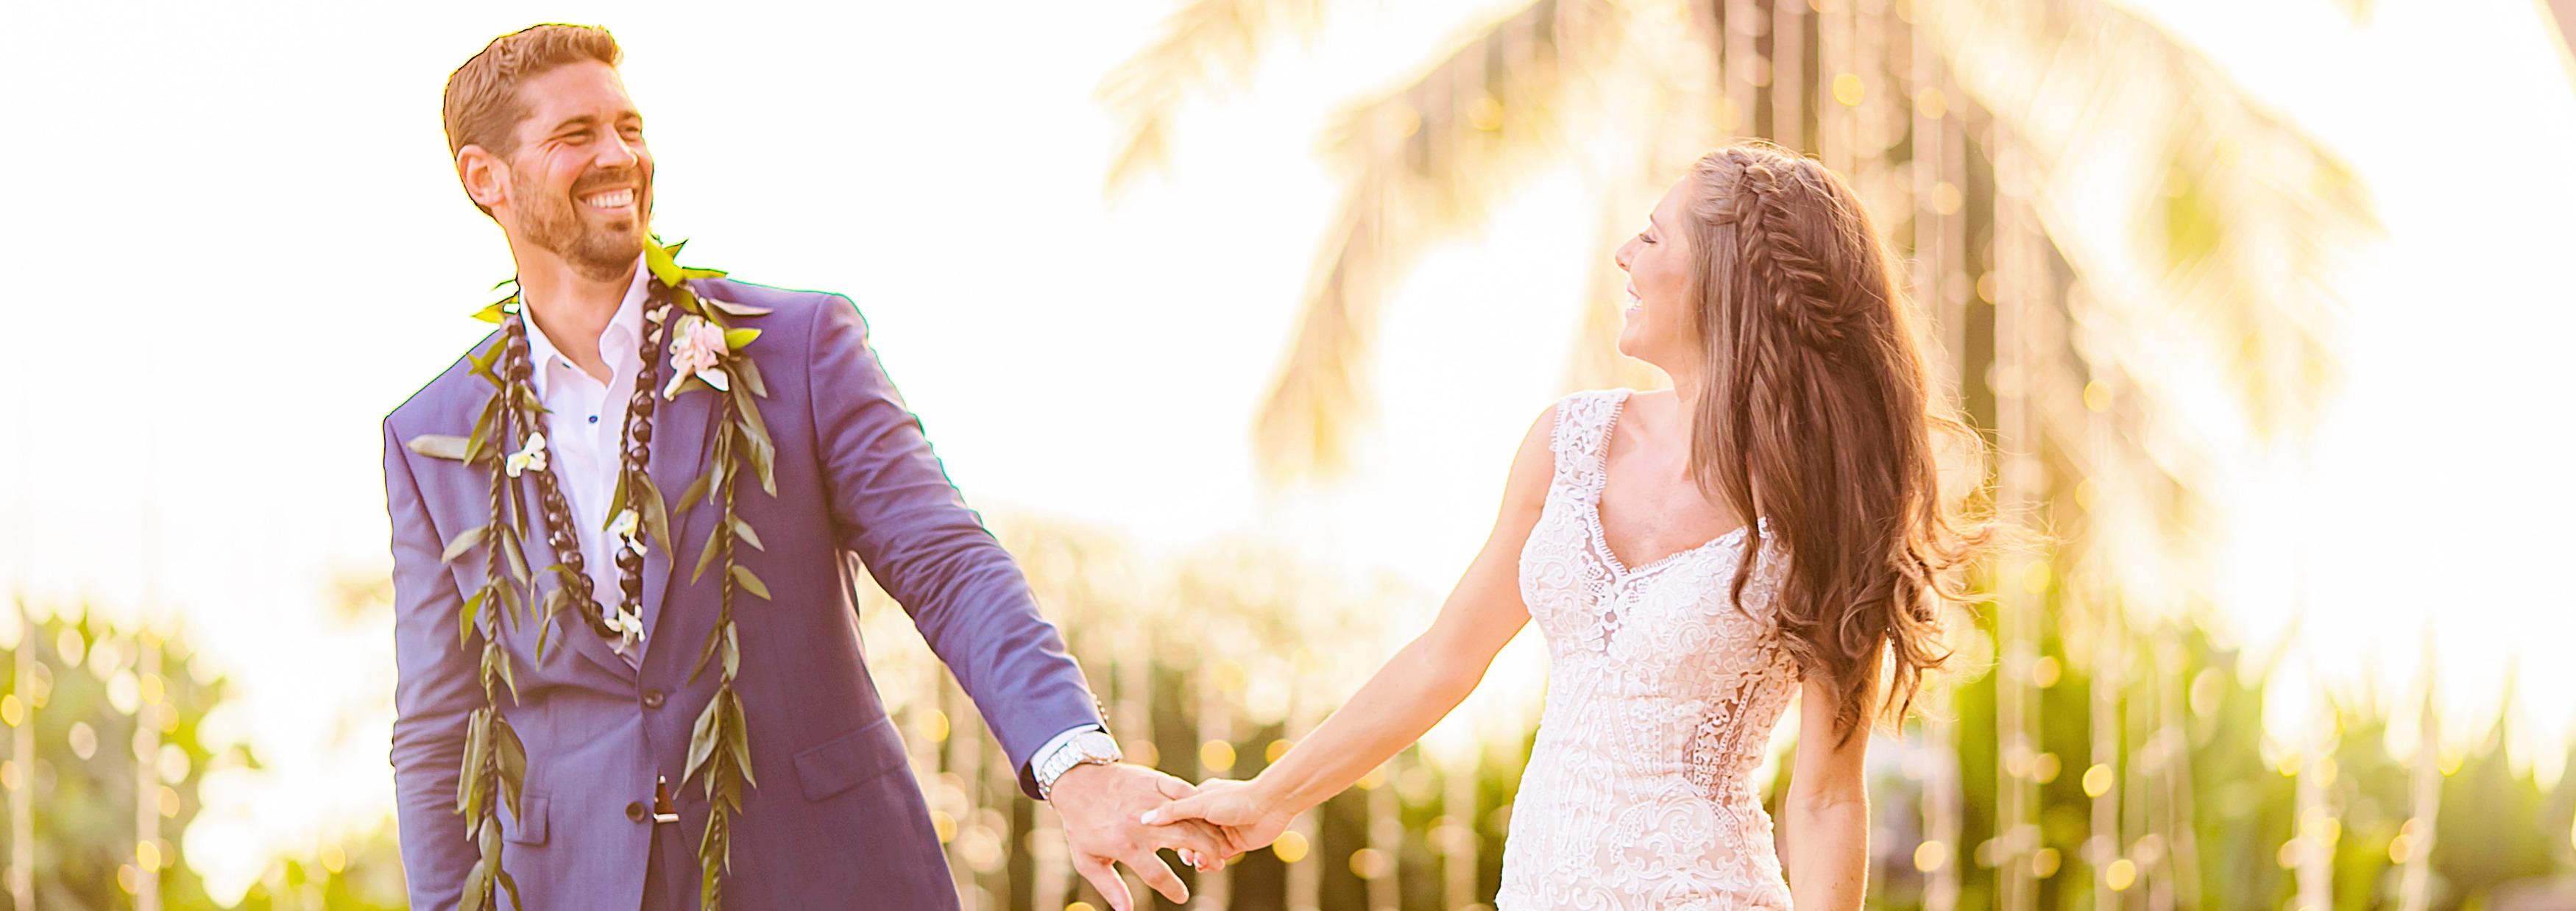 Maui Wedding Planner | Maui's Angels